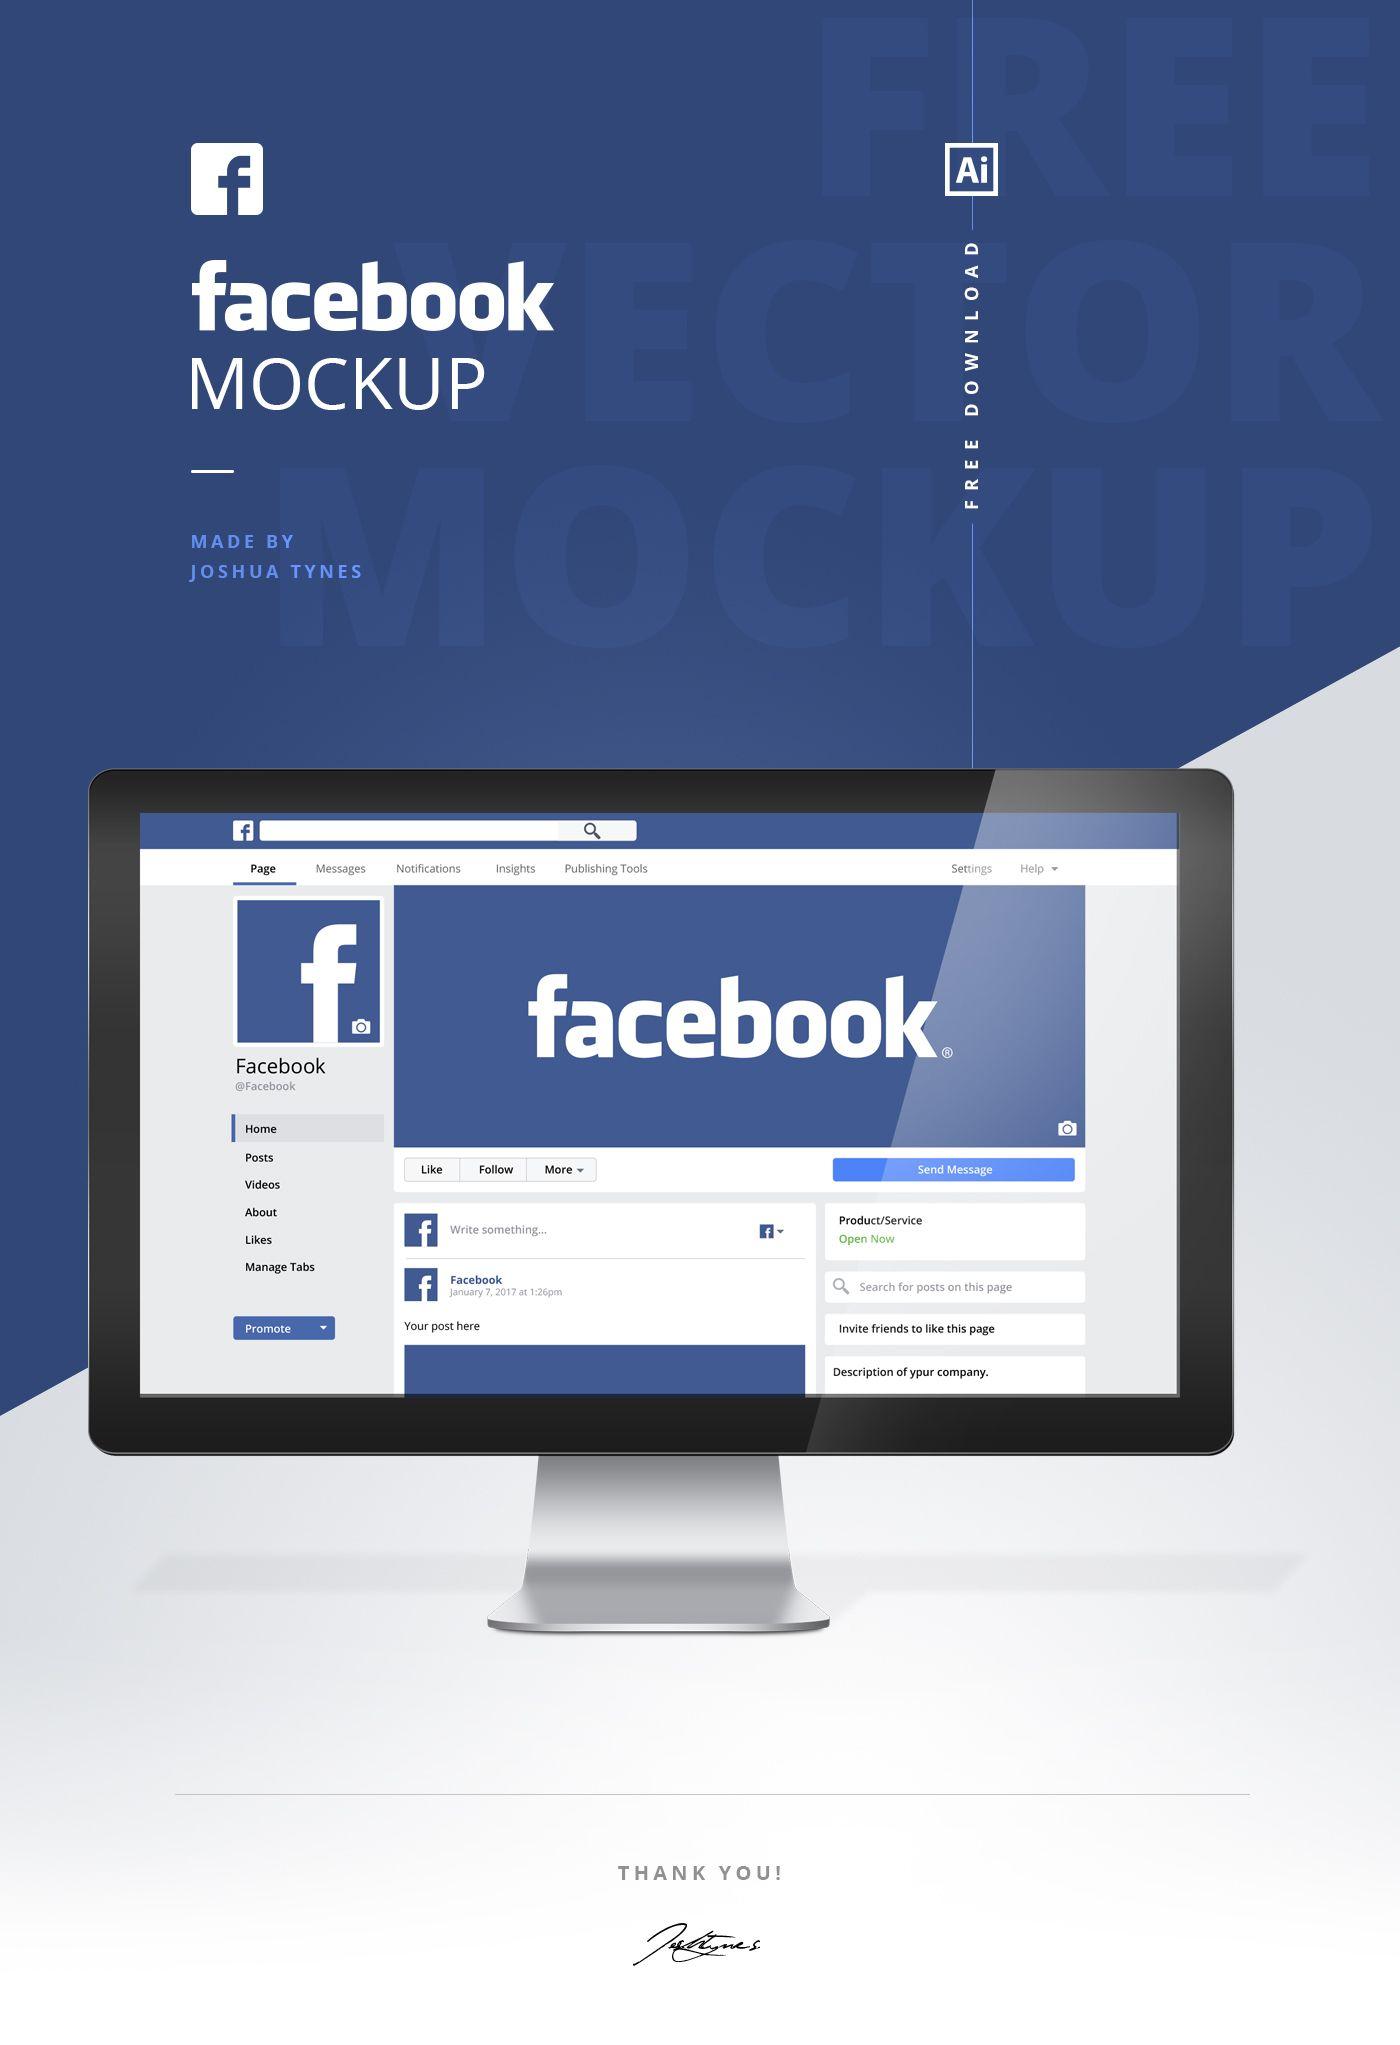 Facebook Mockup - | mockup | Facebook mockup, Mockup